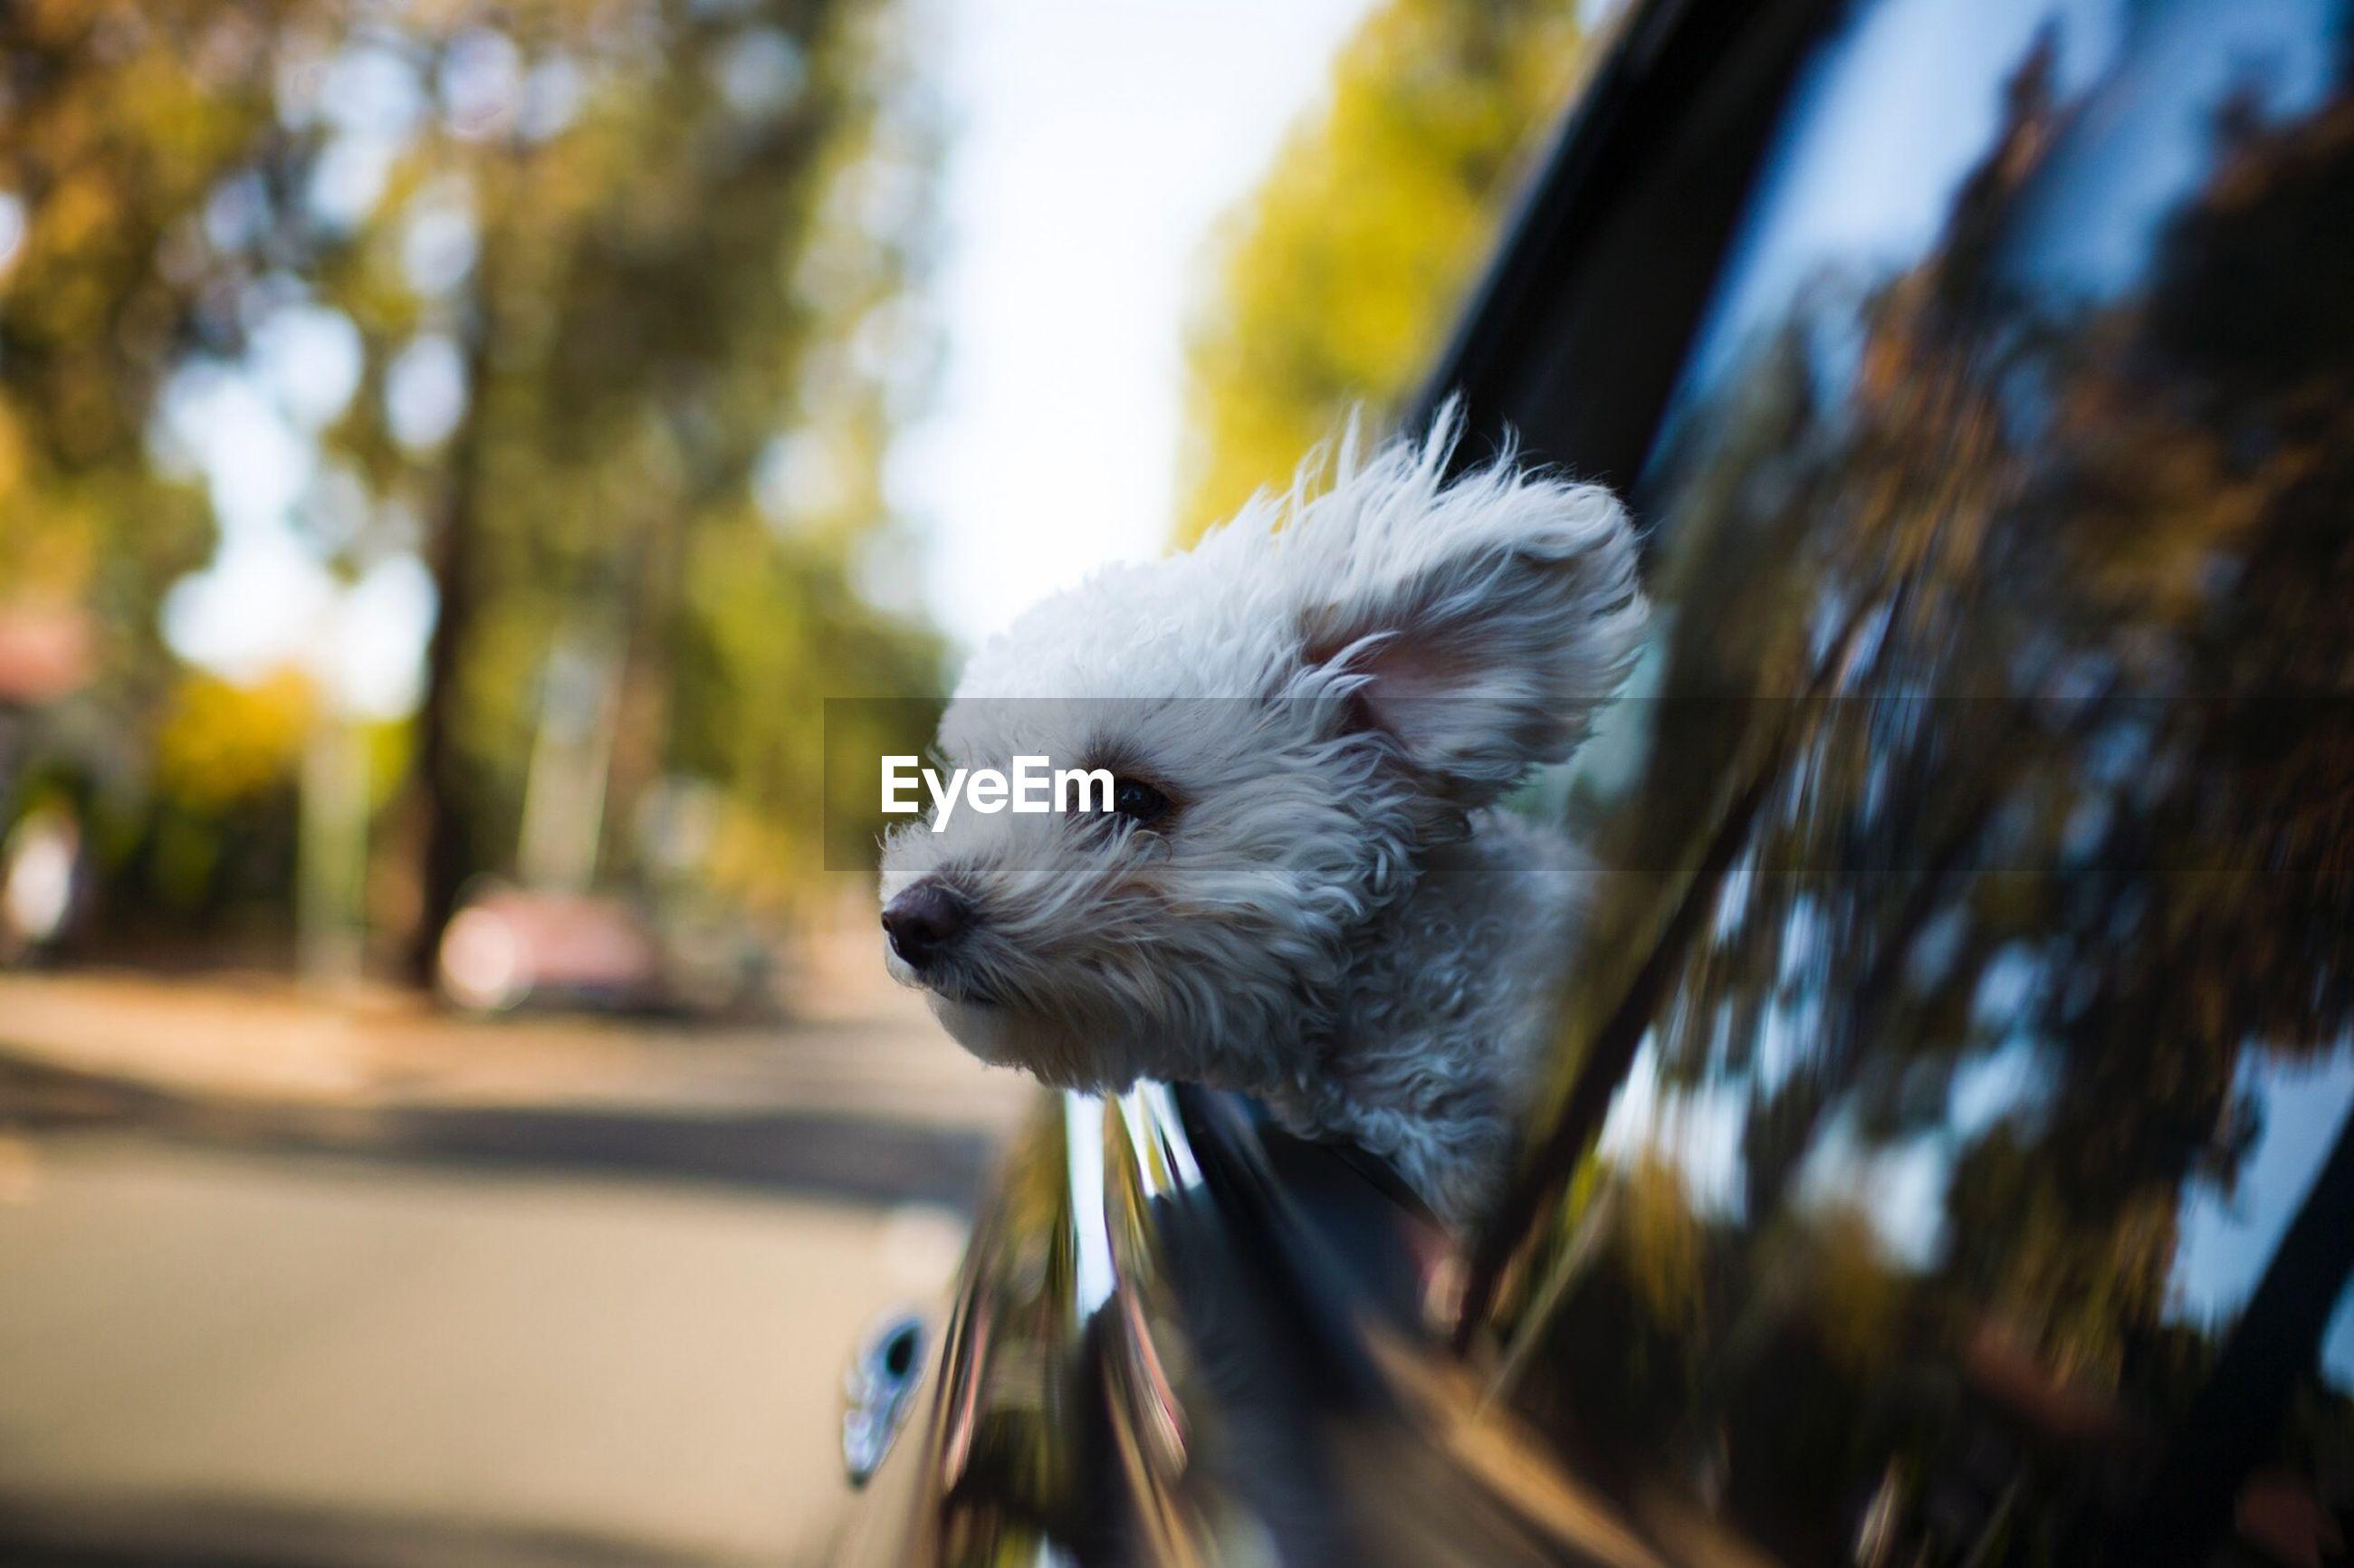 Portrait of dog from car window